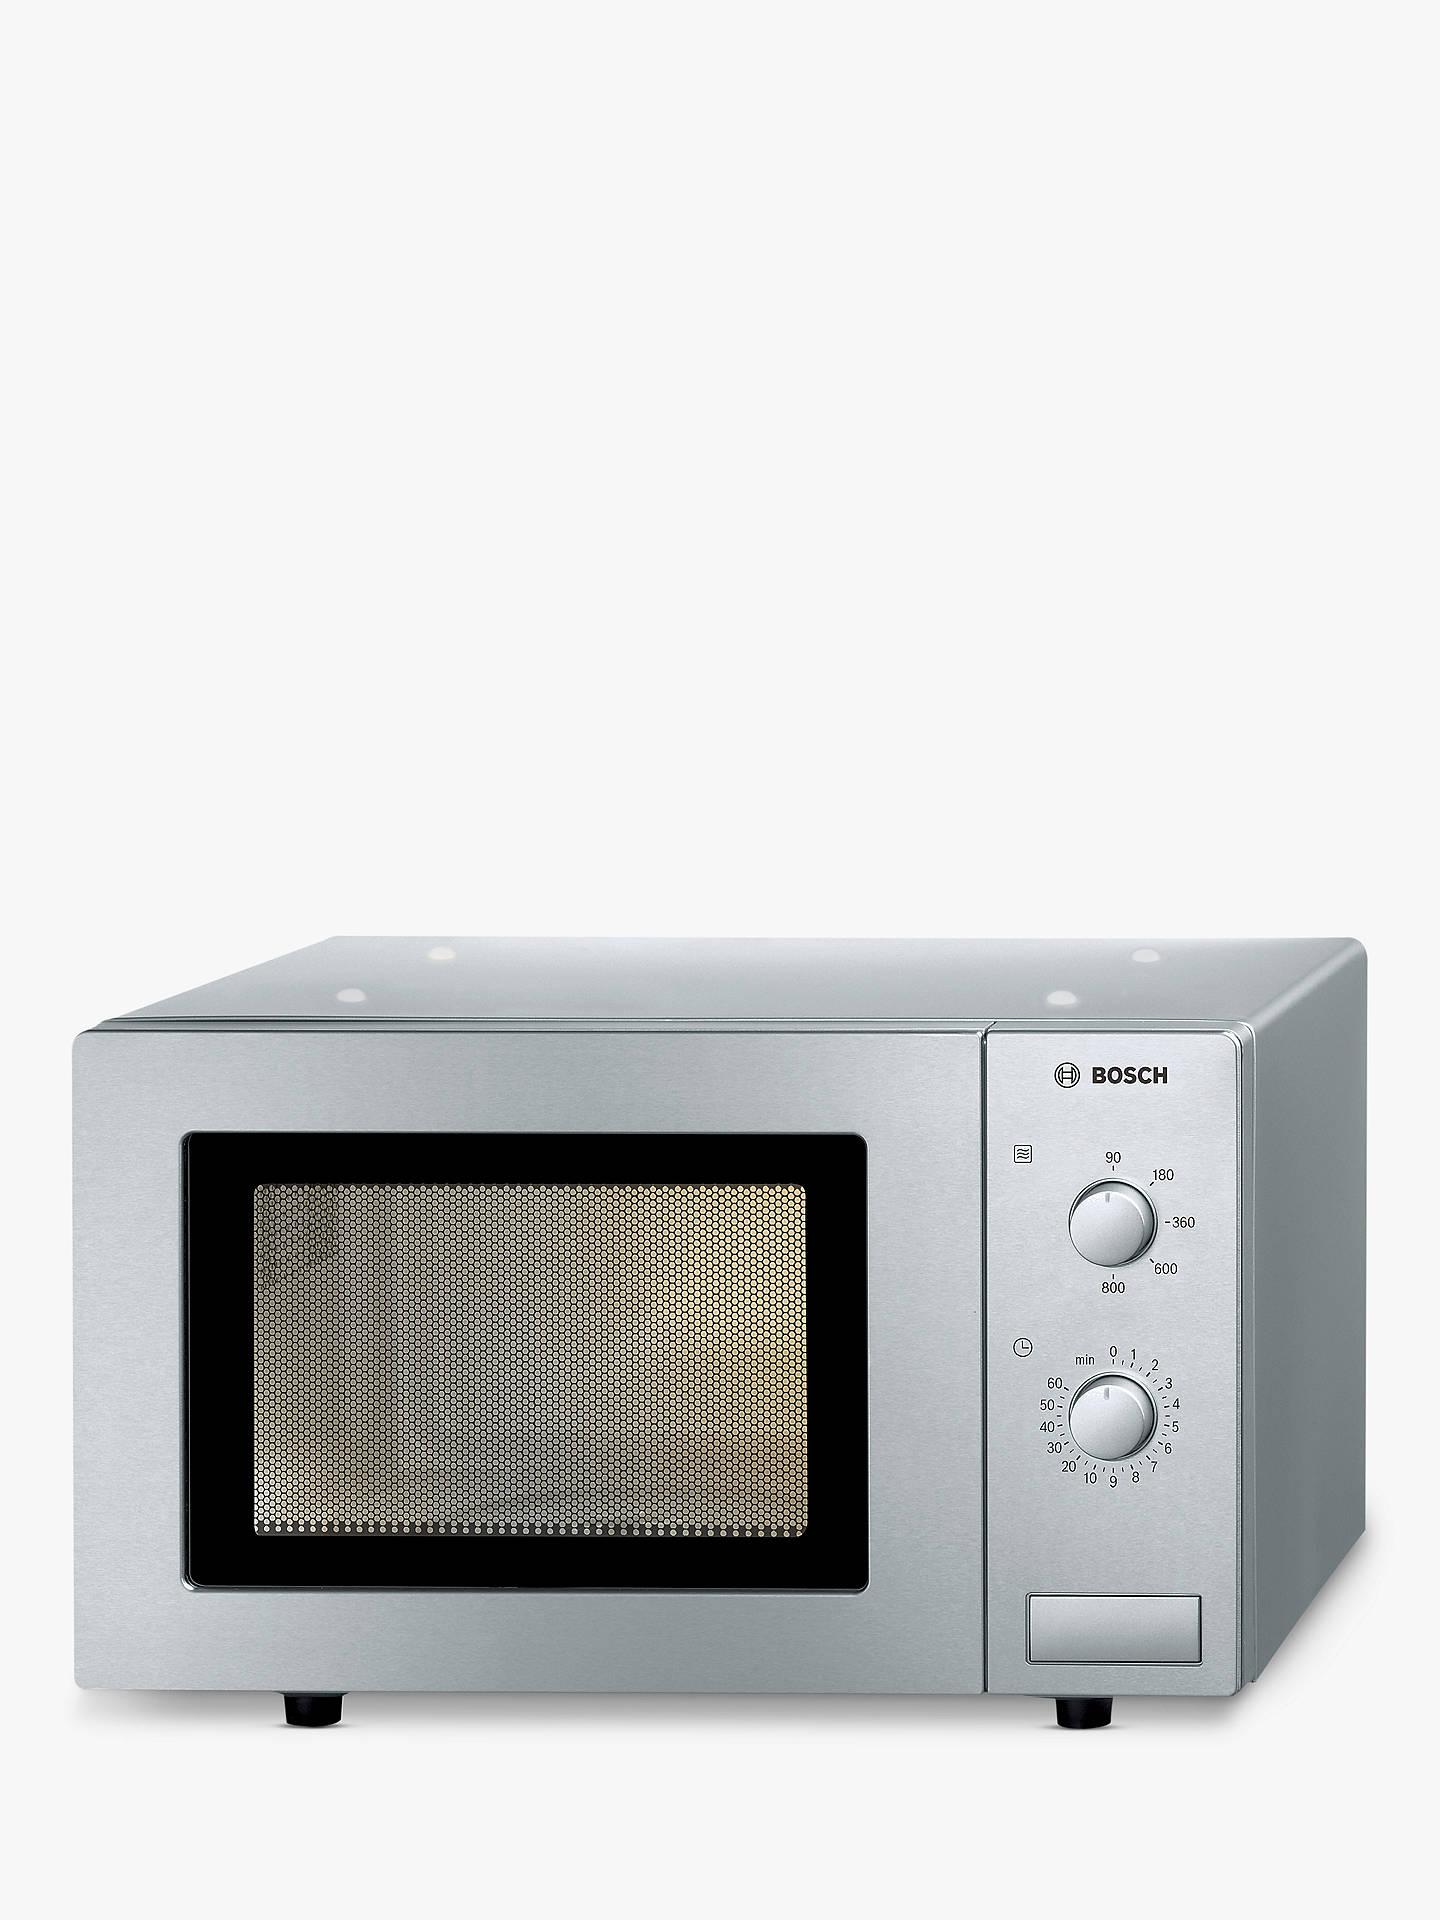 Bosch Hmt72m450b Microwave Oven